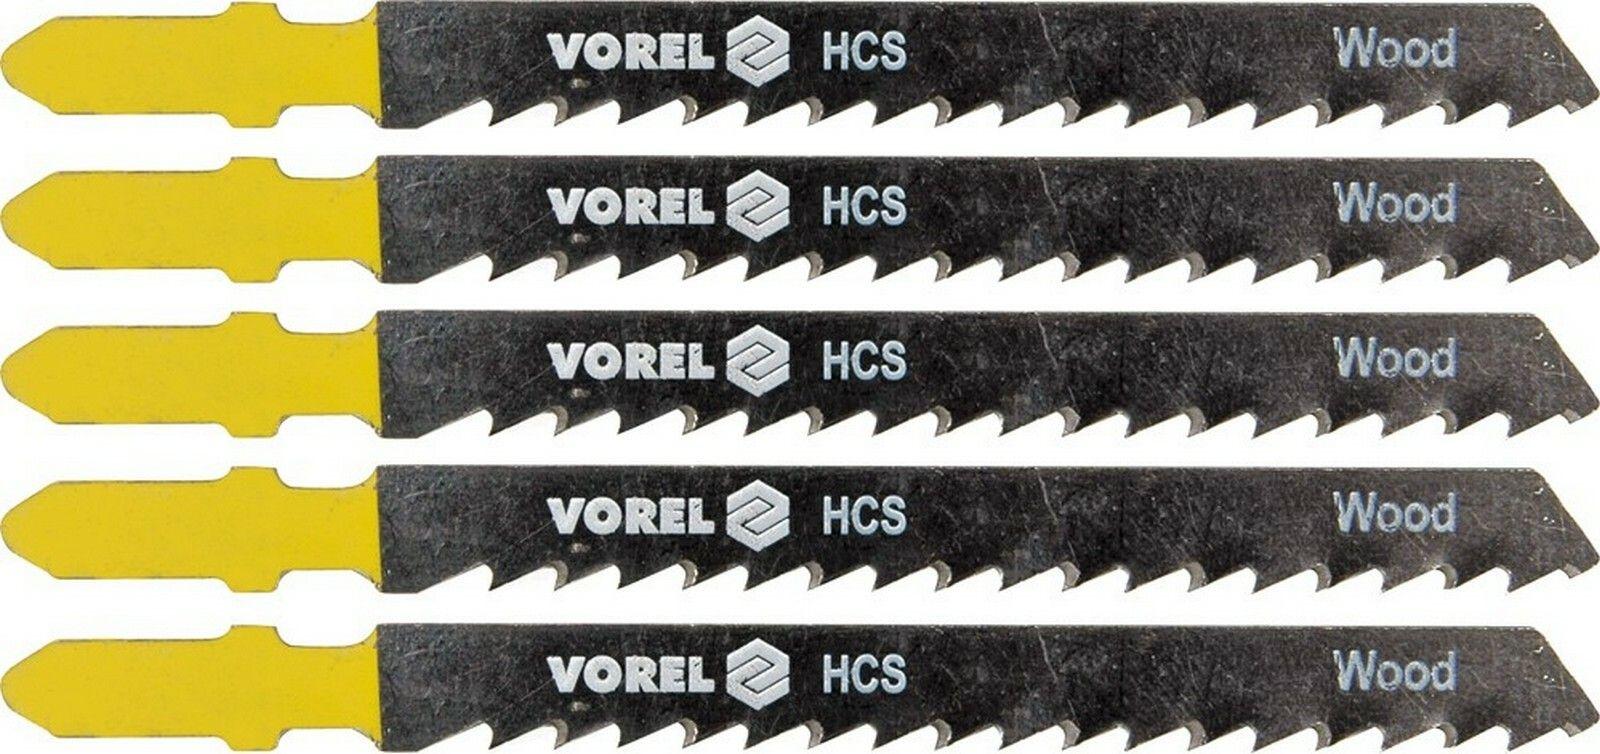 List do přímočaré pily 100 mm na dřevo, plast a kov TPI8 5 ks TOYA